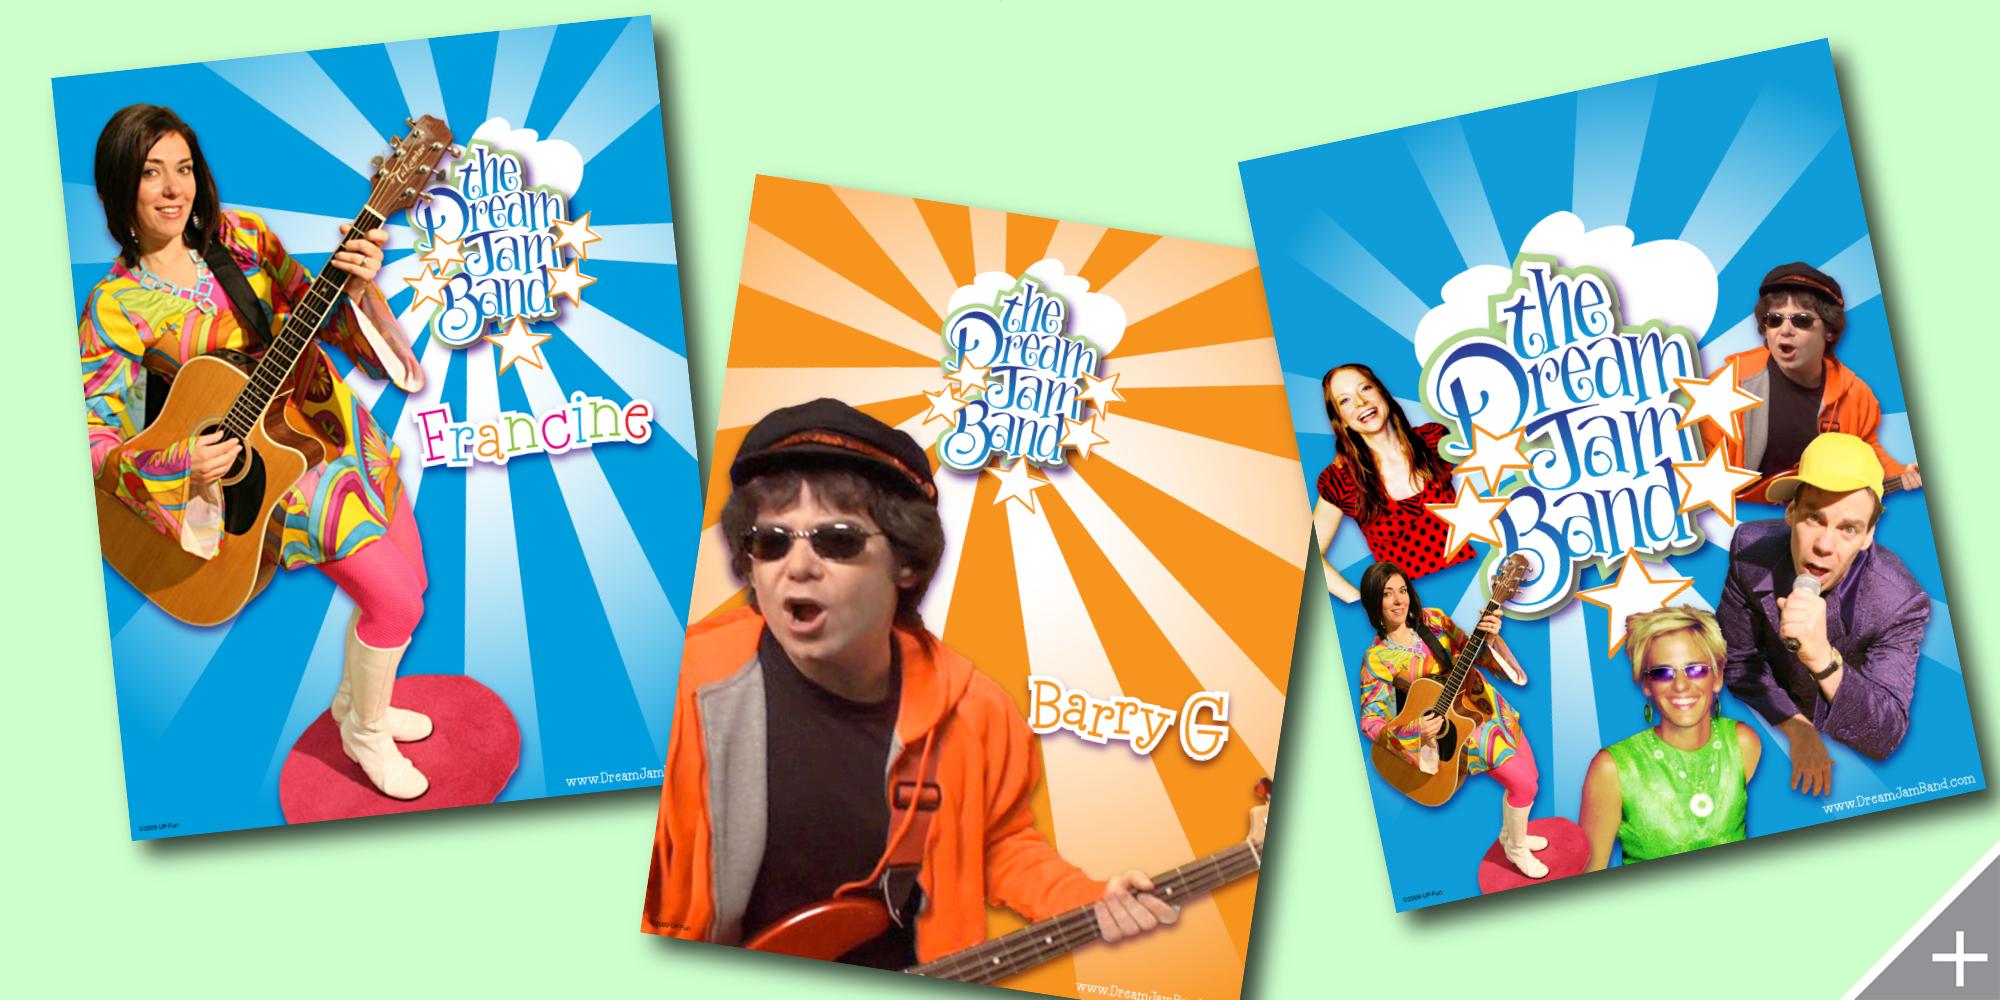 PRINT DESIGN/MERCHANDISE DESIGN - The Dream Jam Band   Posters - ©UnParalleled, LLC dba UP-Ideas / Roger Sawhill / Mark Braught - Atlanta, Georgia   Lawrenceville, Georgia   Commerce, Georgia